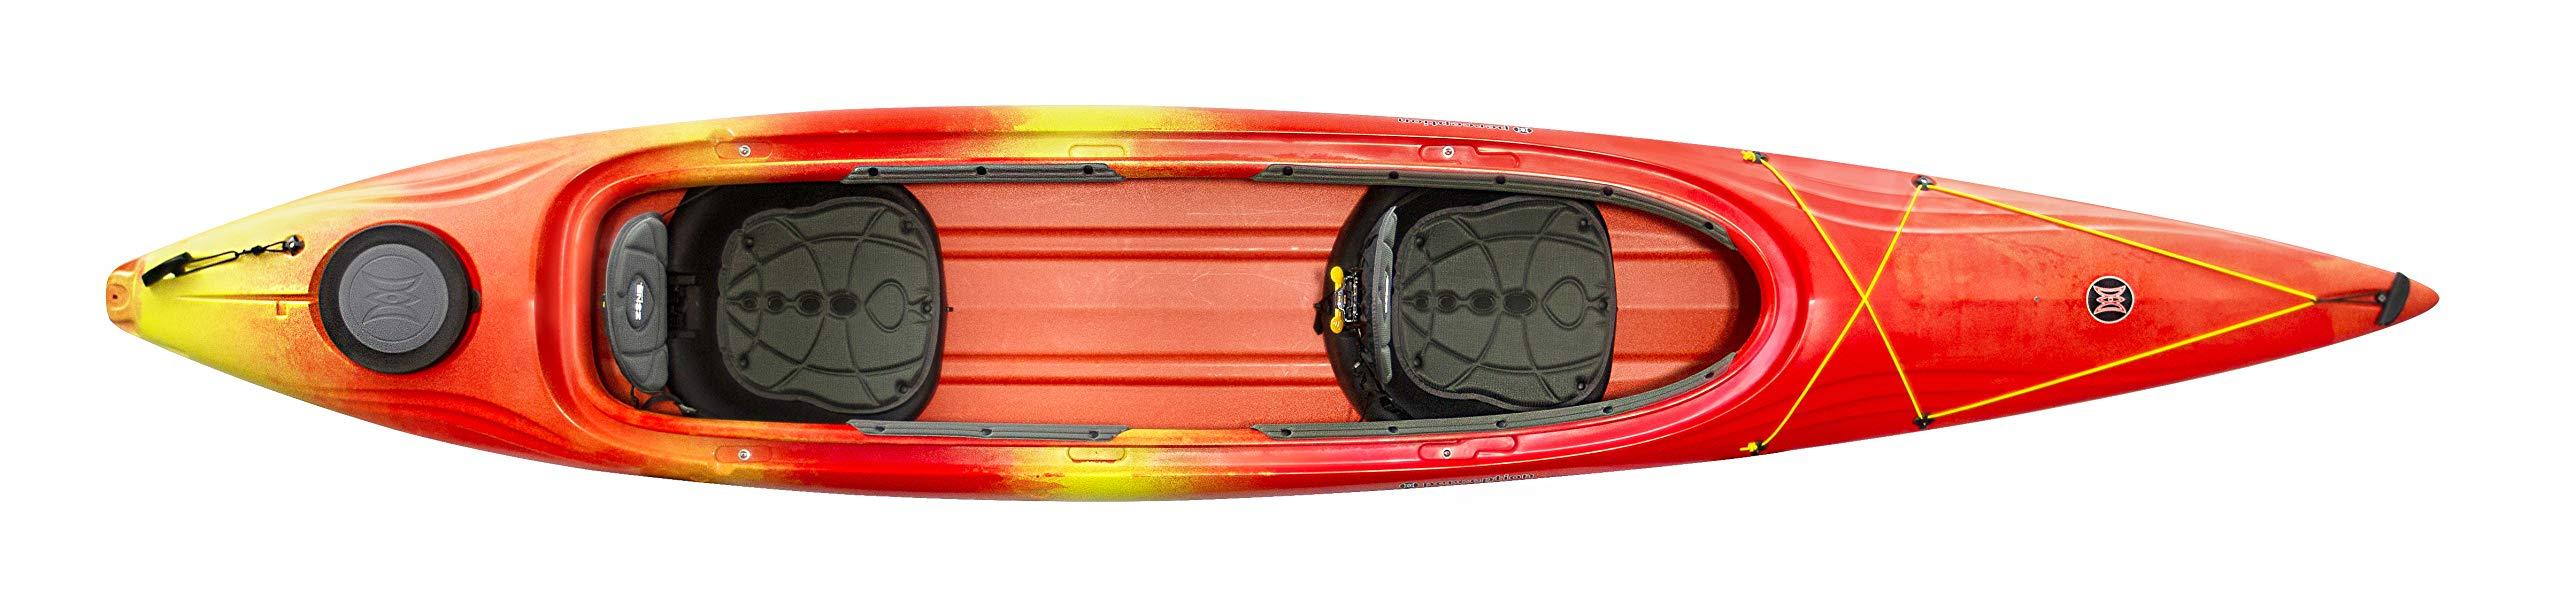 Perception Cove 14.5 Kayak, Red/Yellow by Perception Kayaks